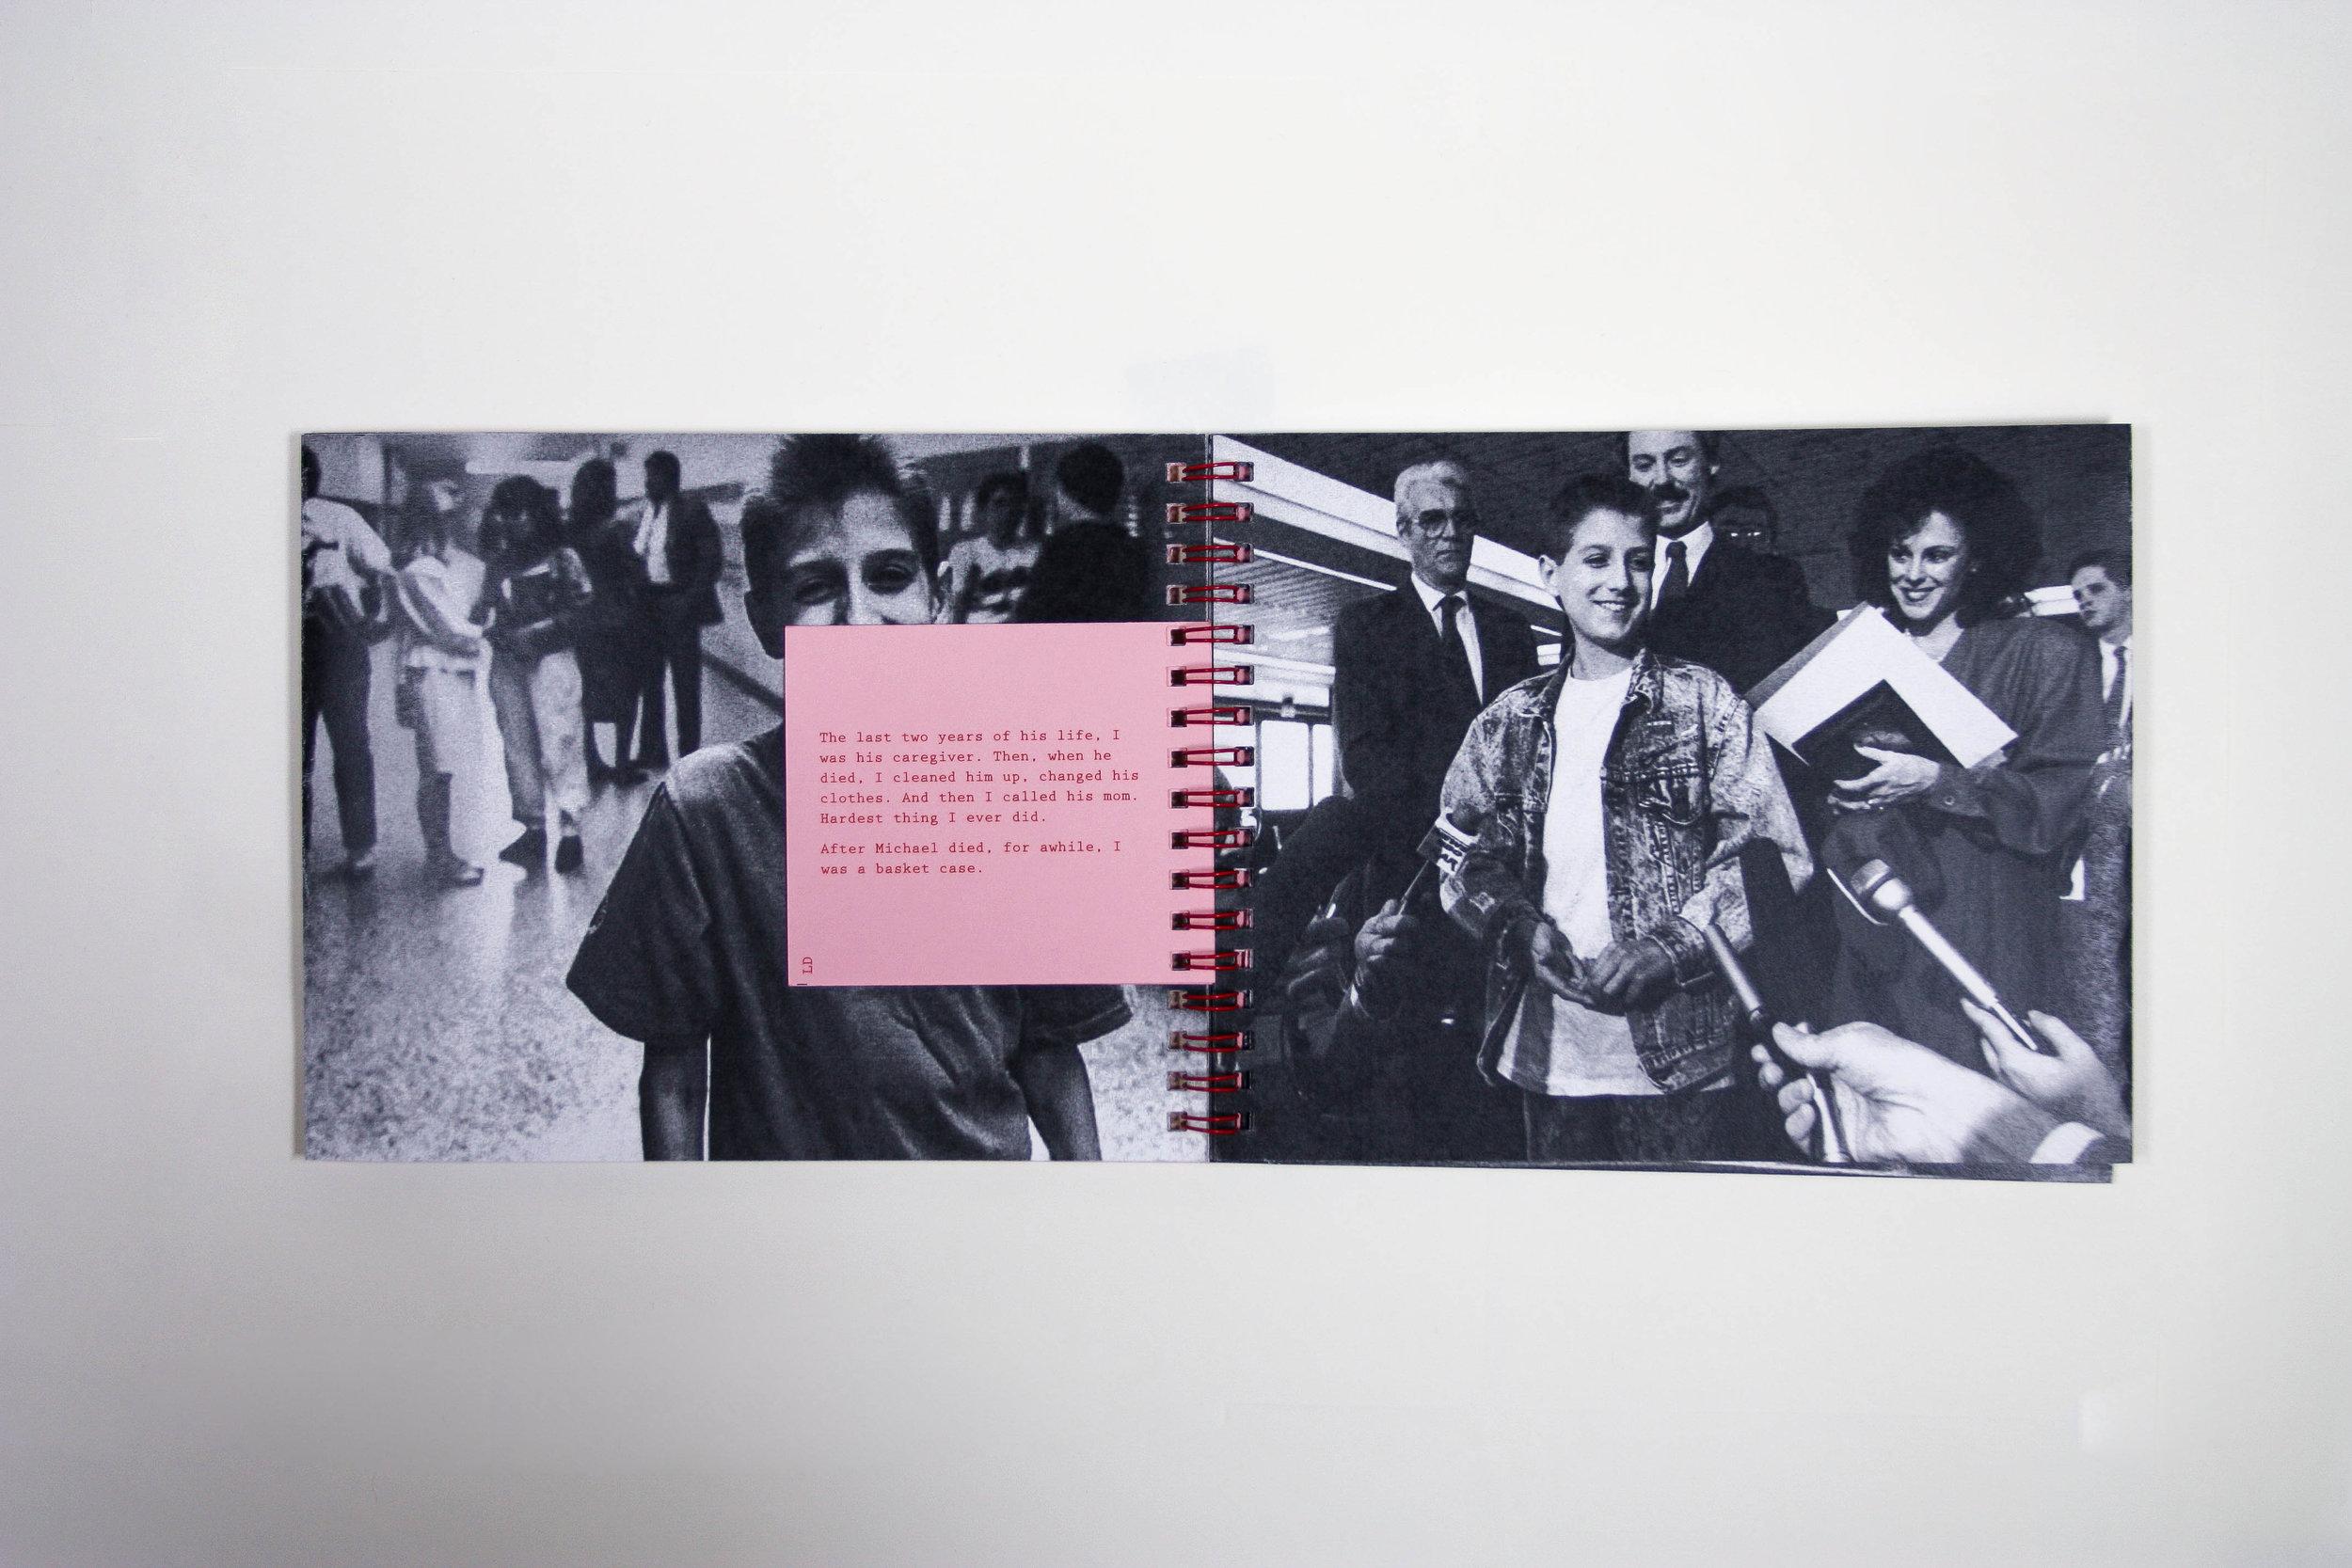 estory-bookimages-12.jpg